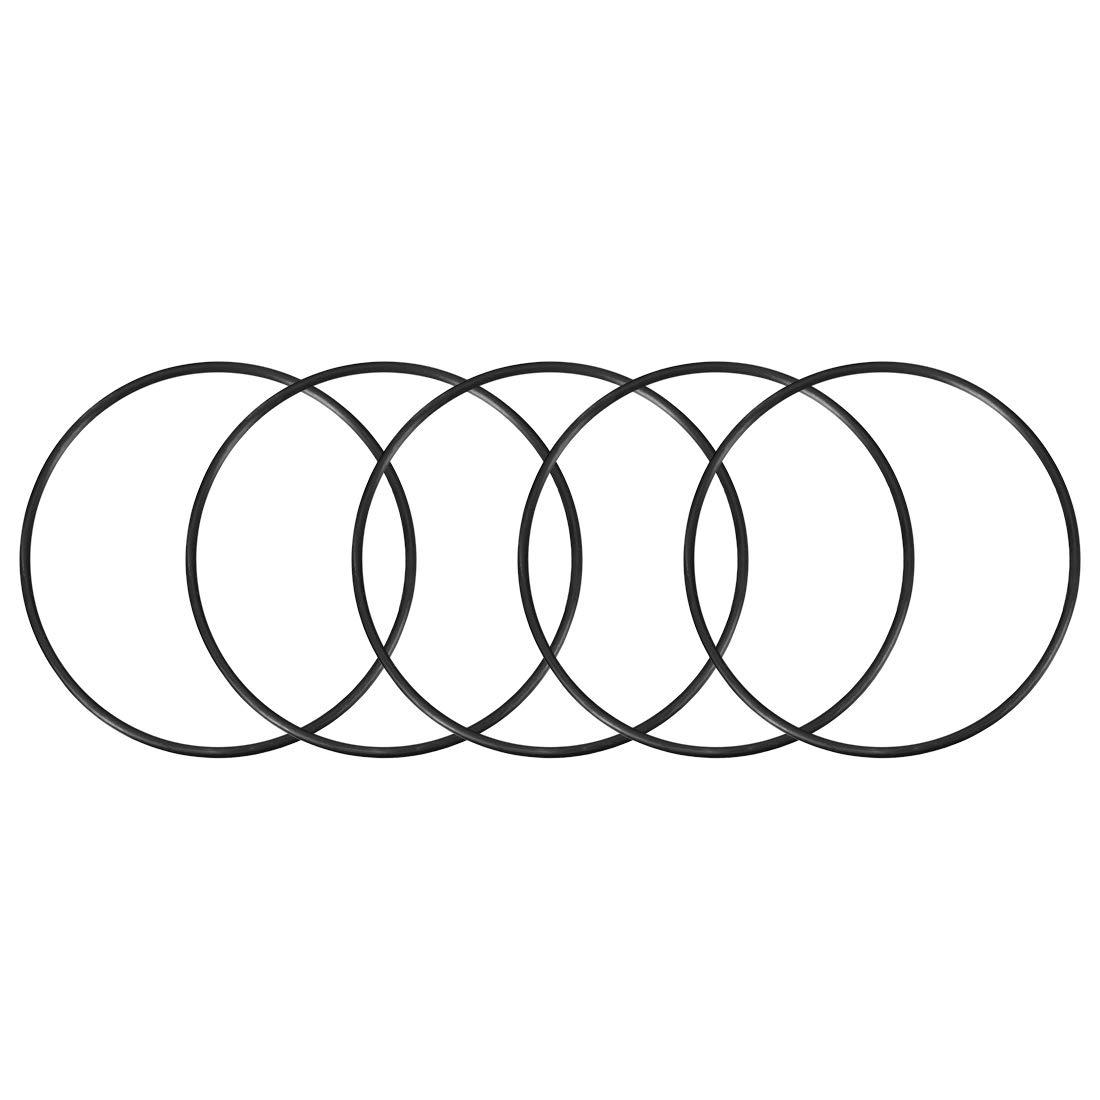 sourcing map 5pcs O-Ringe Nitrilgummi 117mm x 125mm x 4mm Dichtungsringe Dichtung schwarz DE de